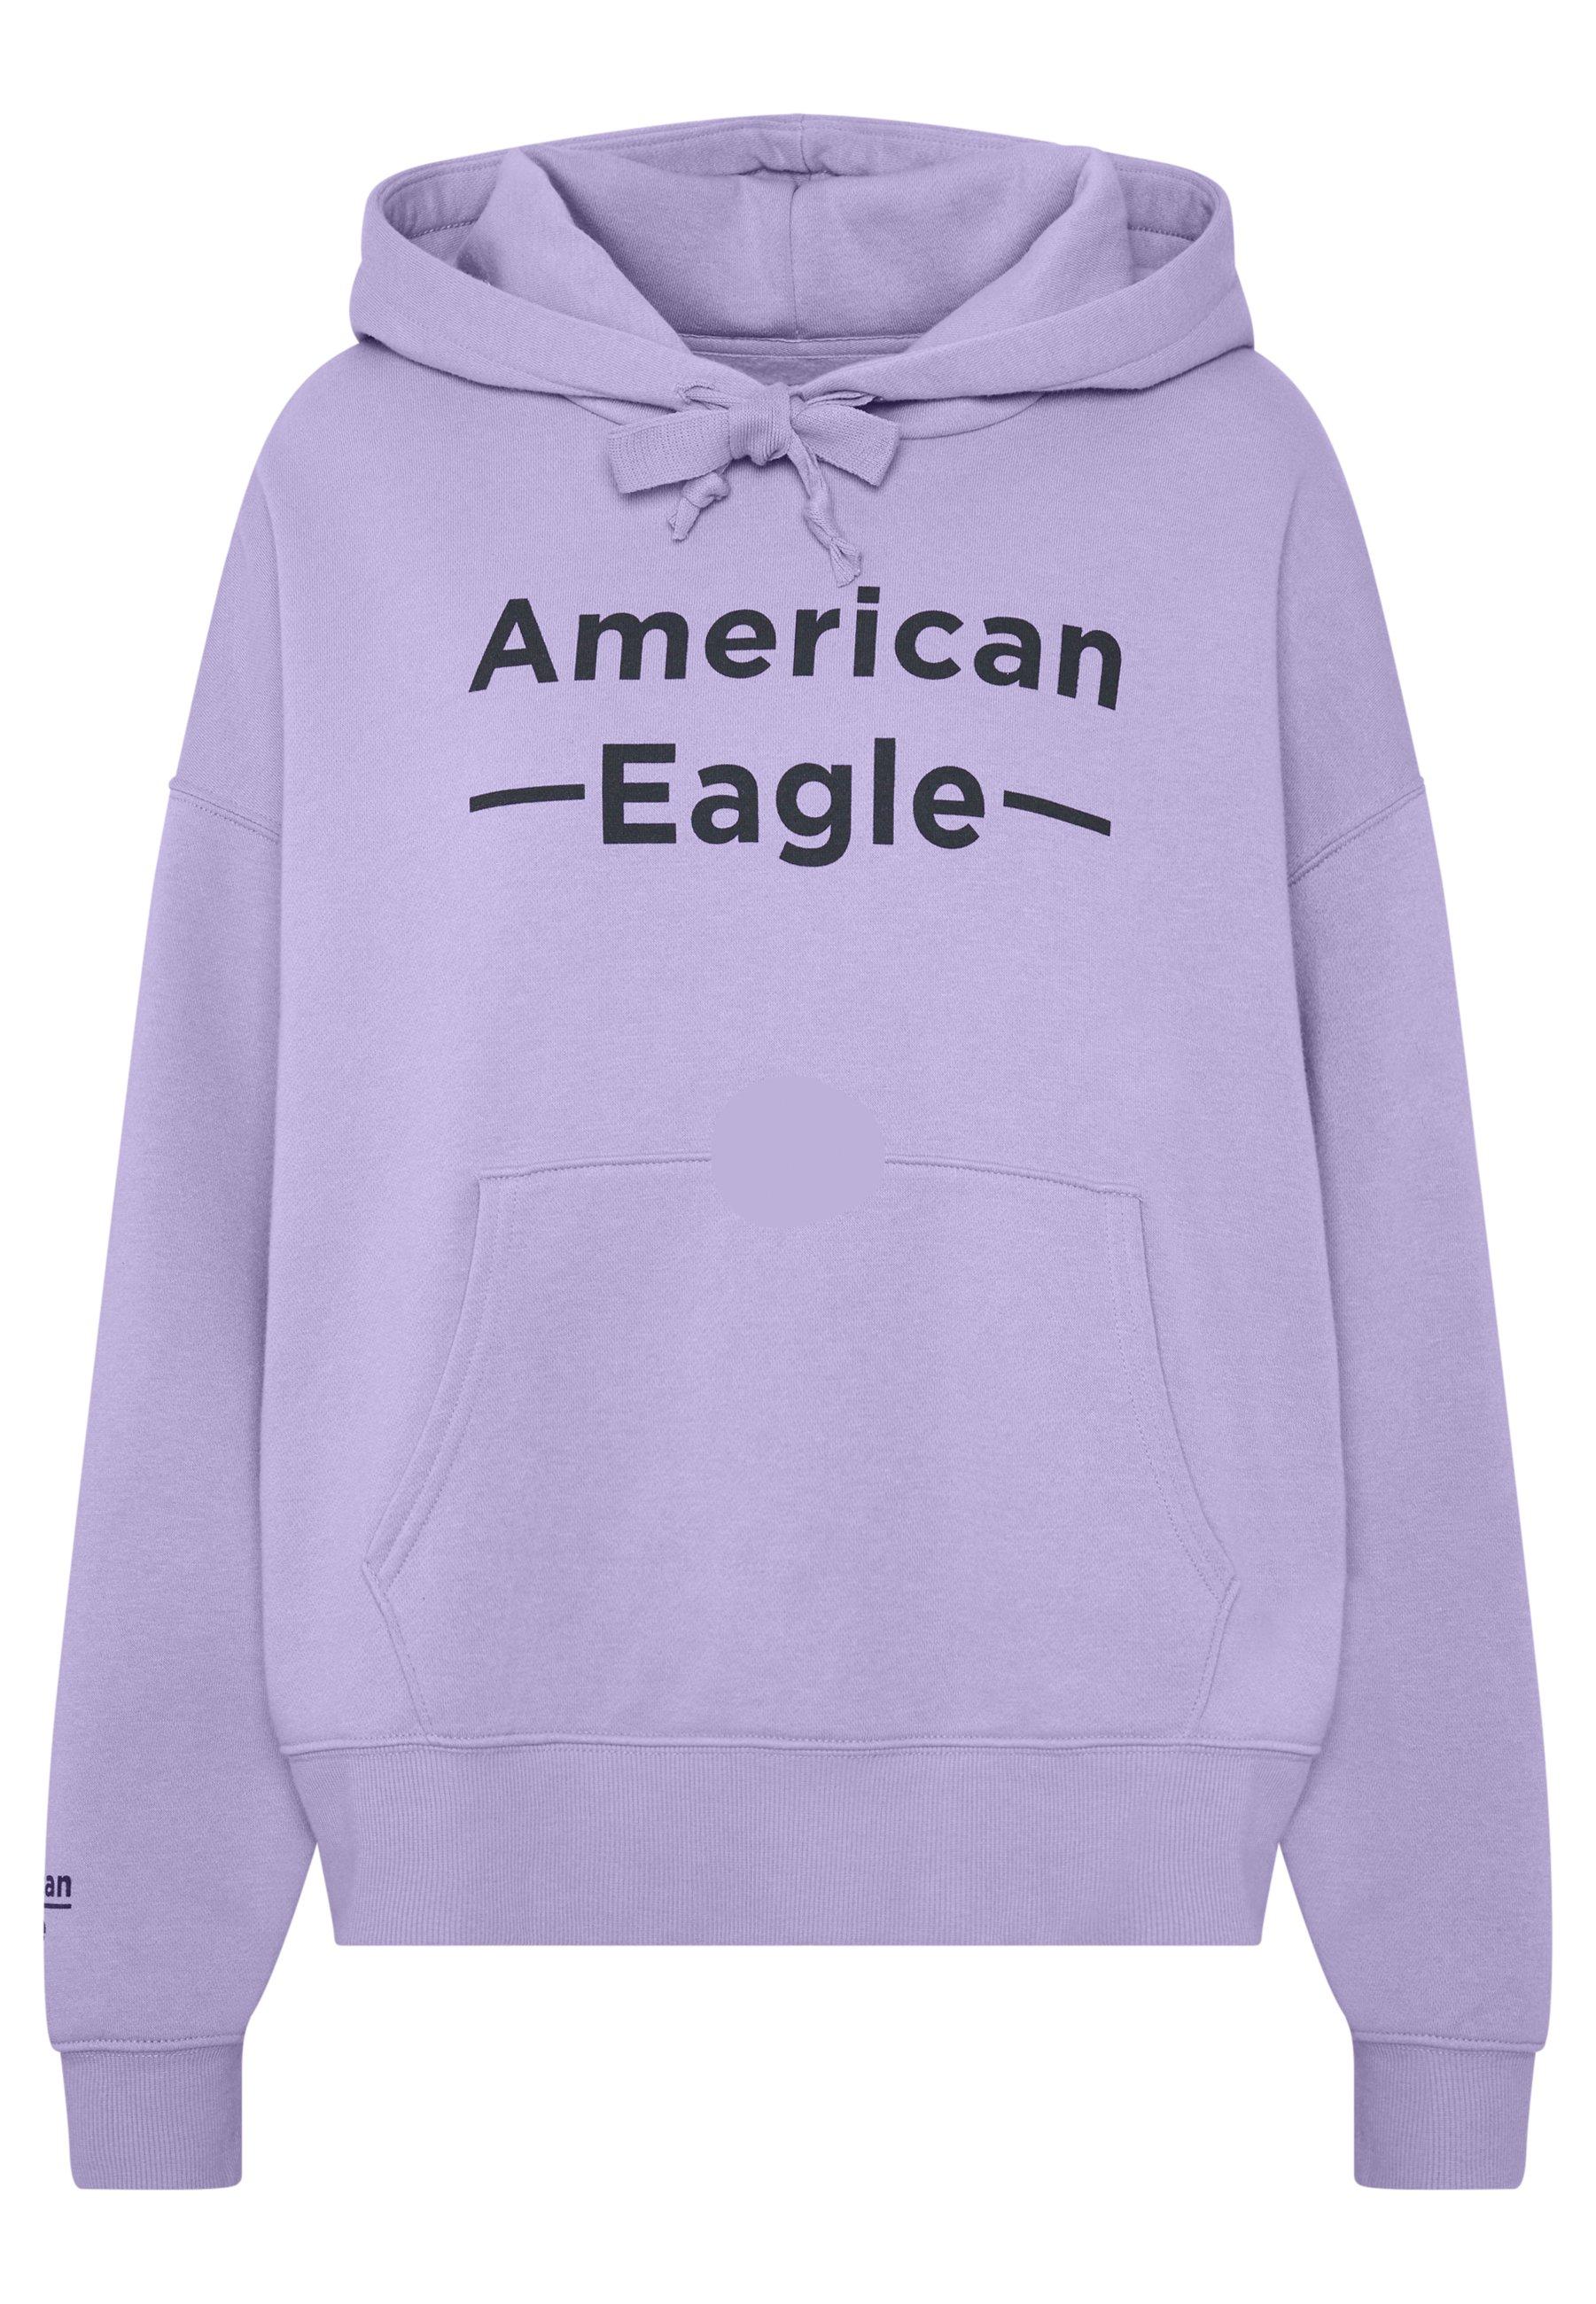 American Eagle Graphics Hoodie - Purple